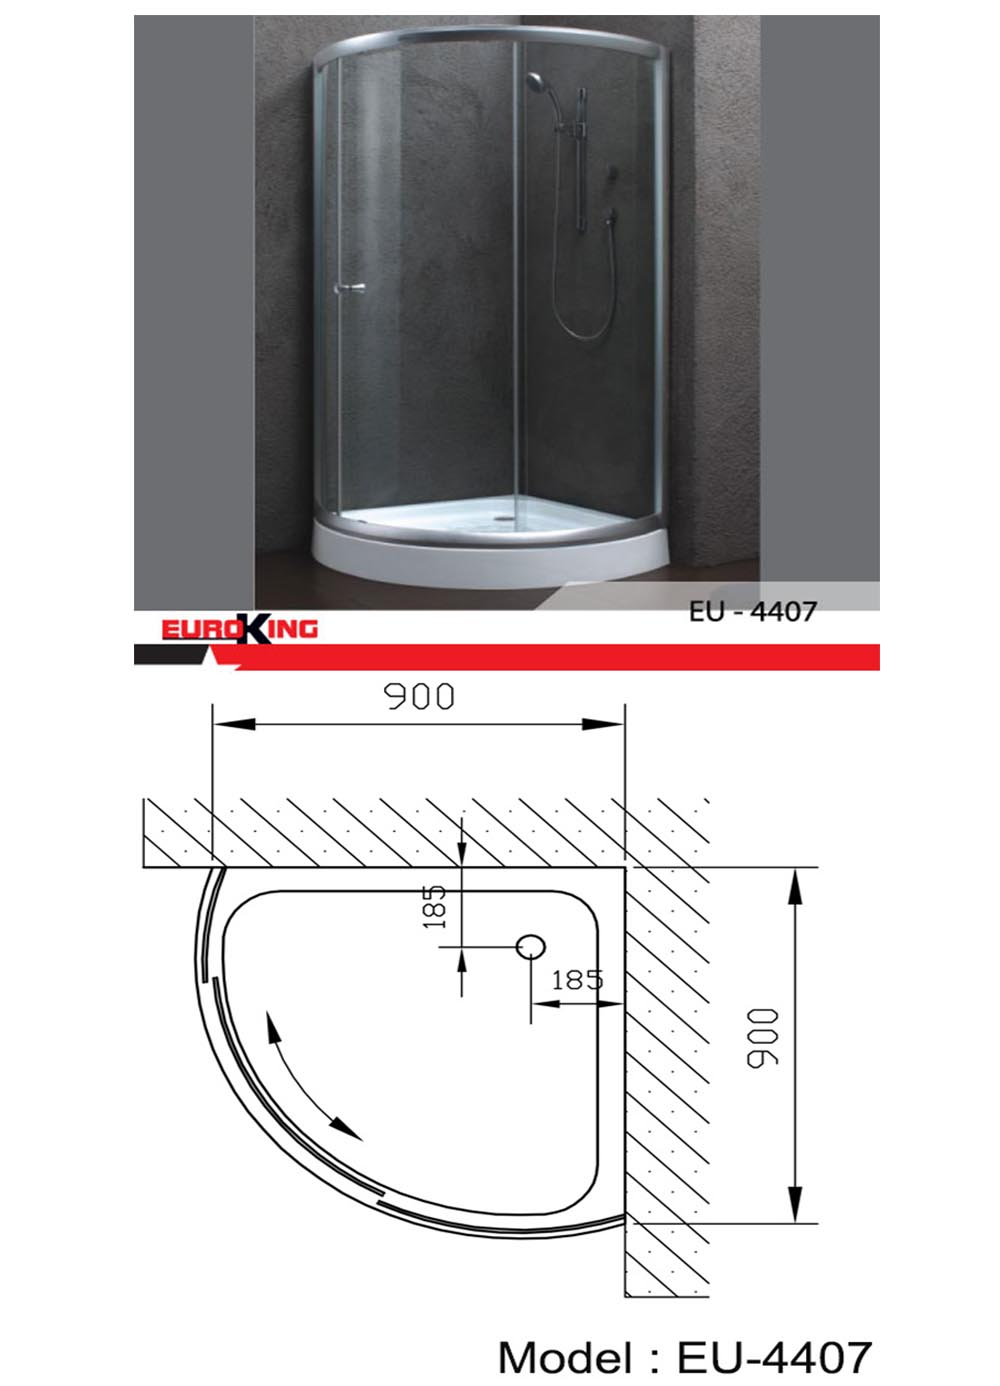 Bảng vẽ kỹ thuật EU-4407